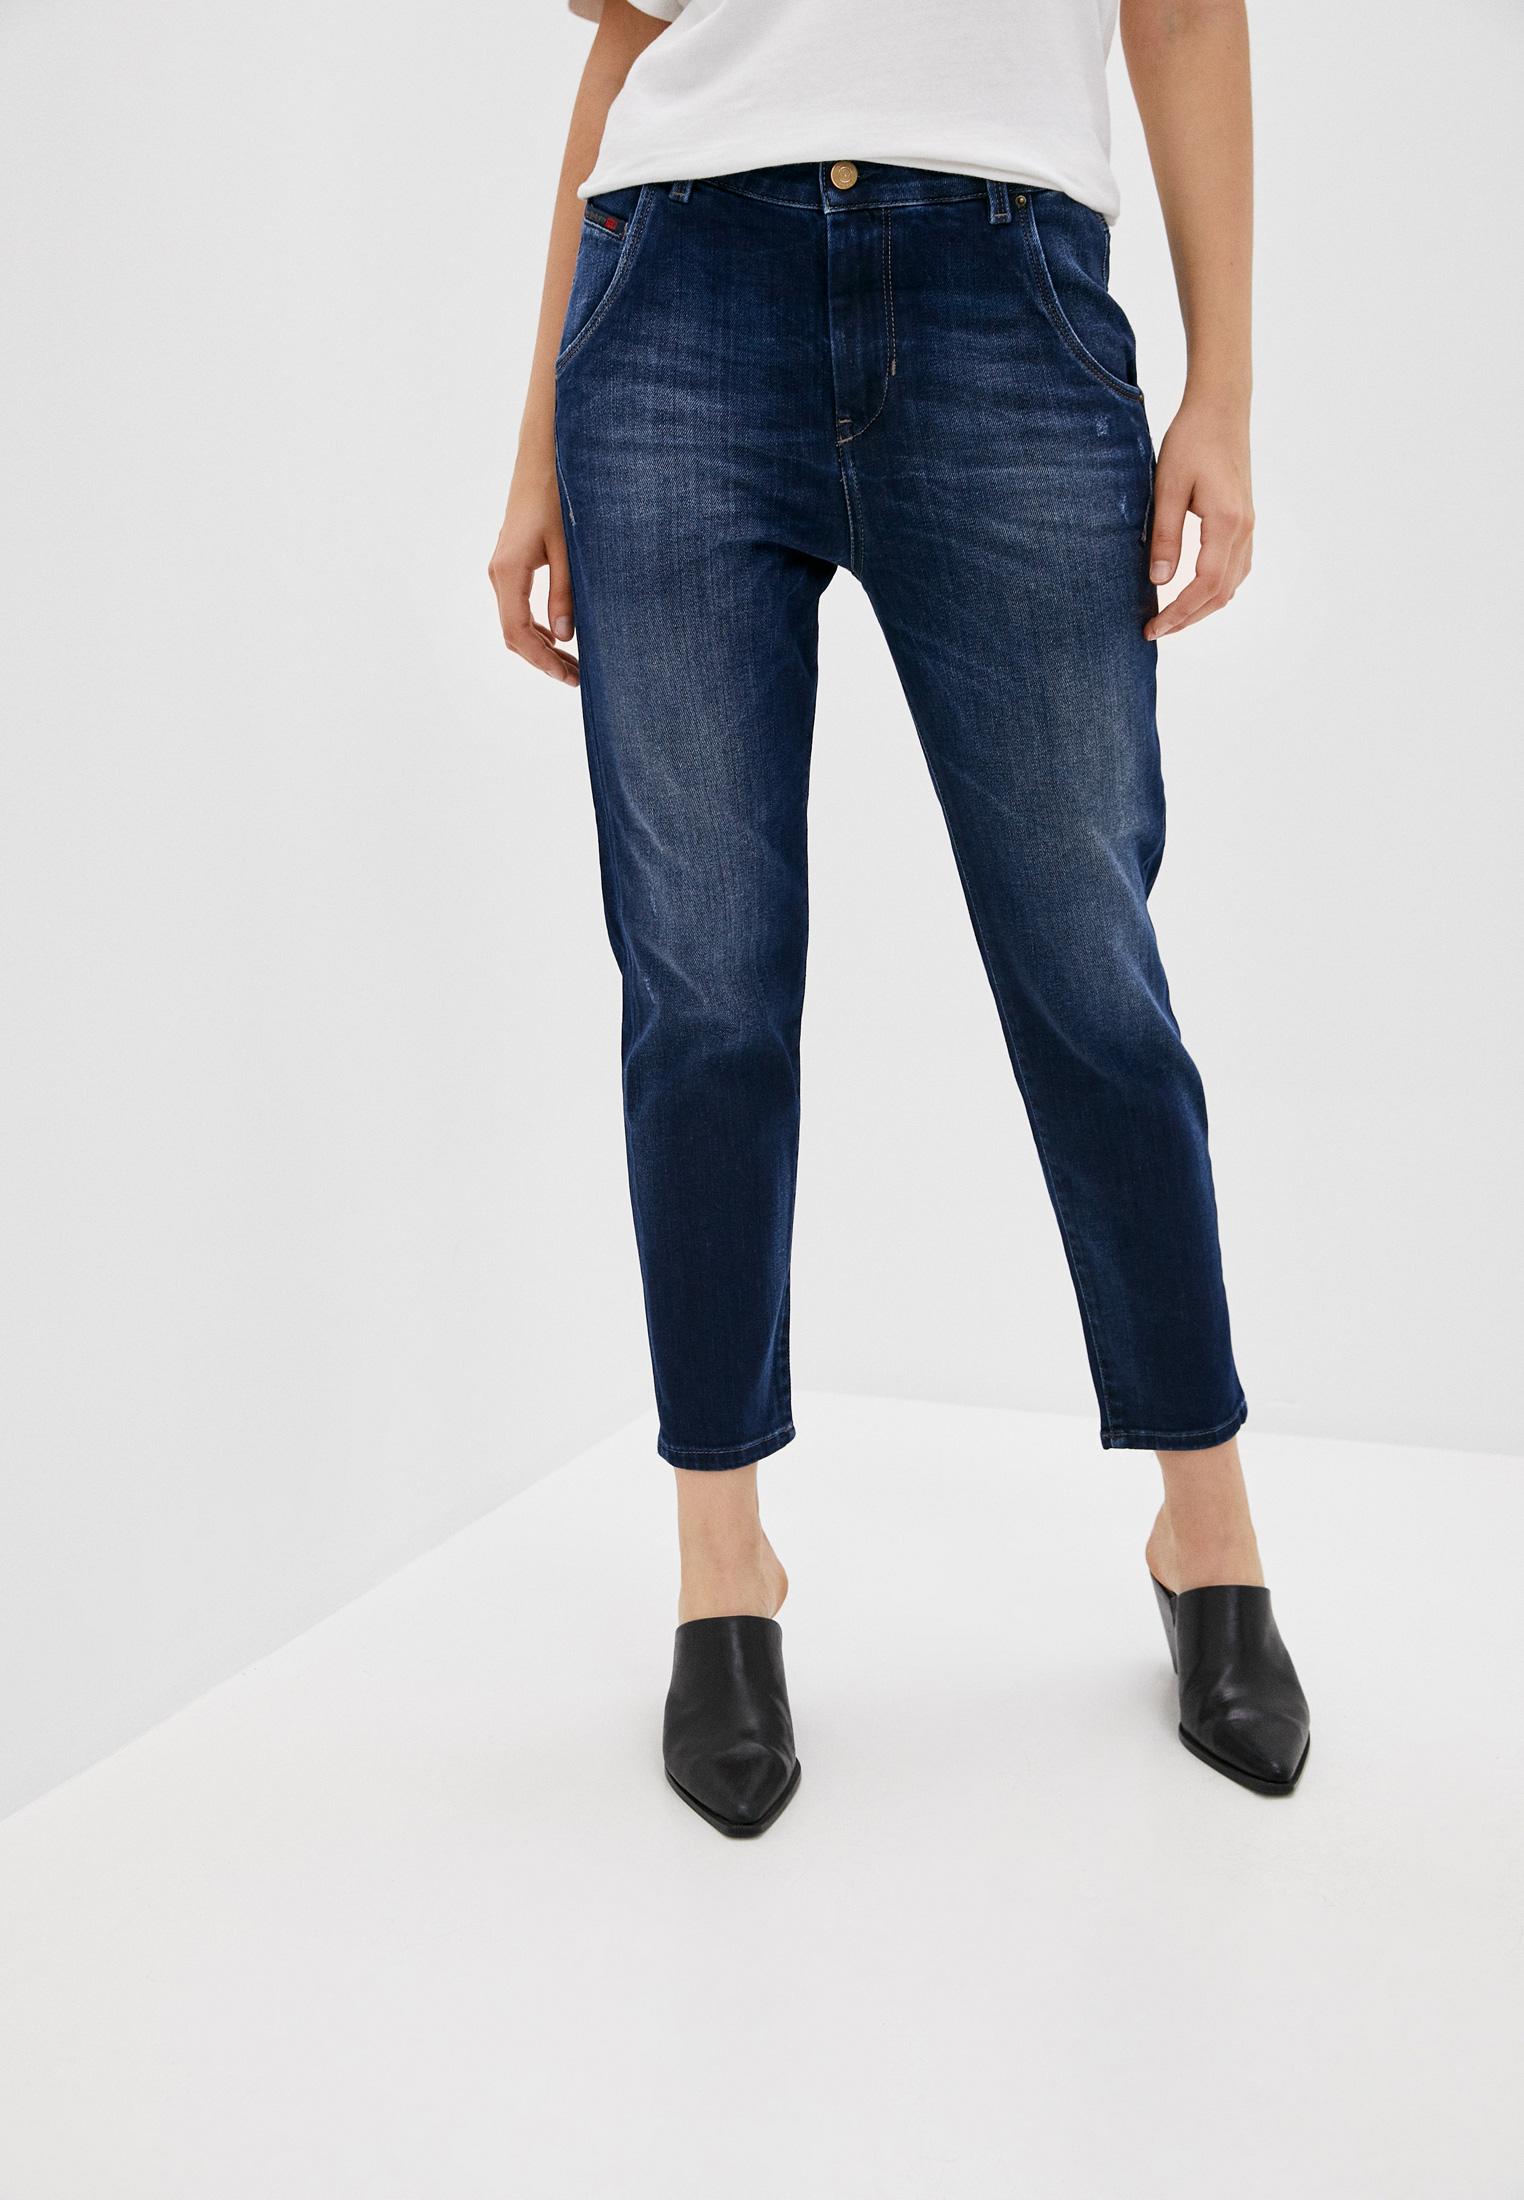 Зауженные джинсы Diesel (Дизель) 00SRIX0860L